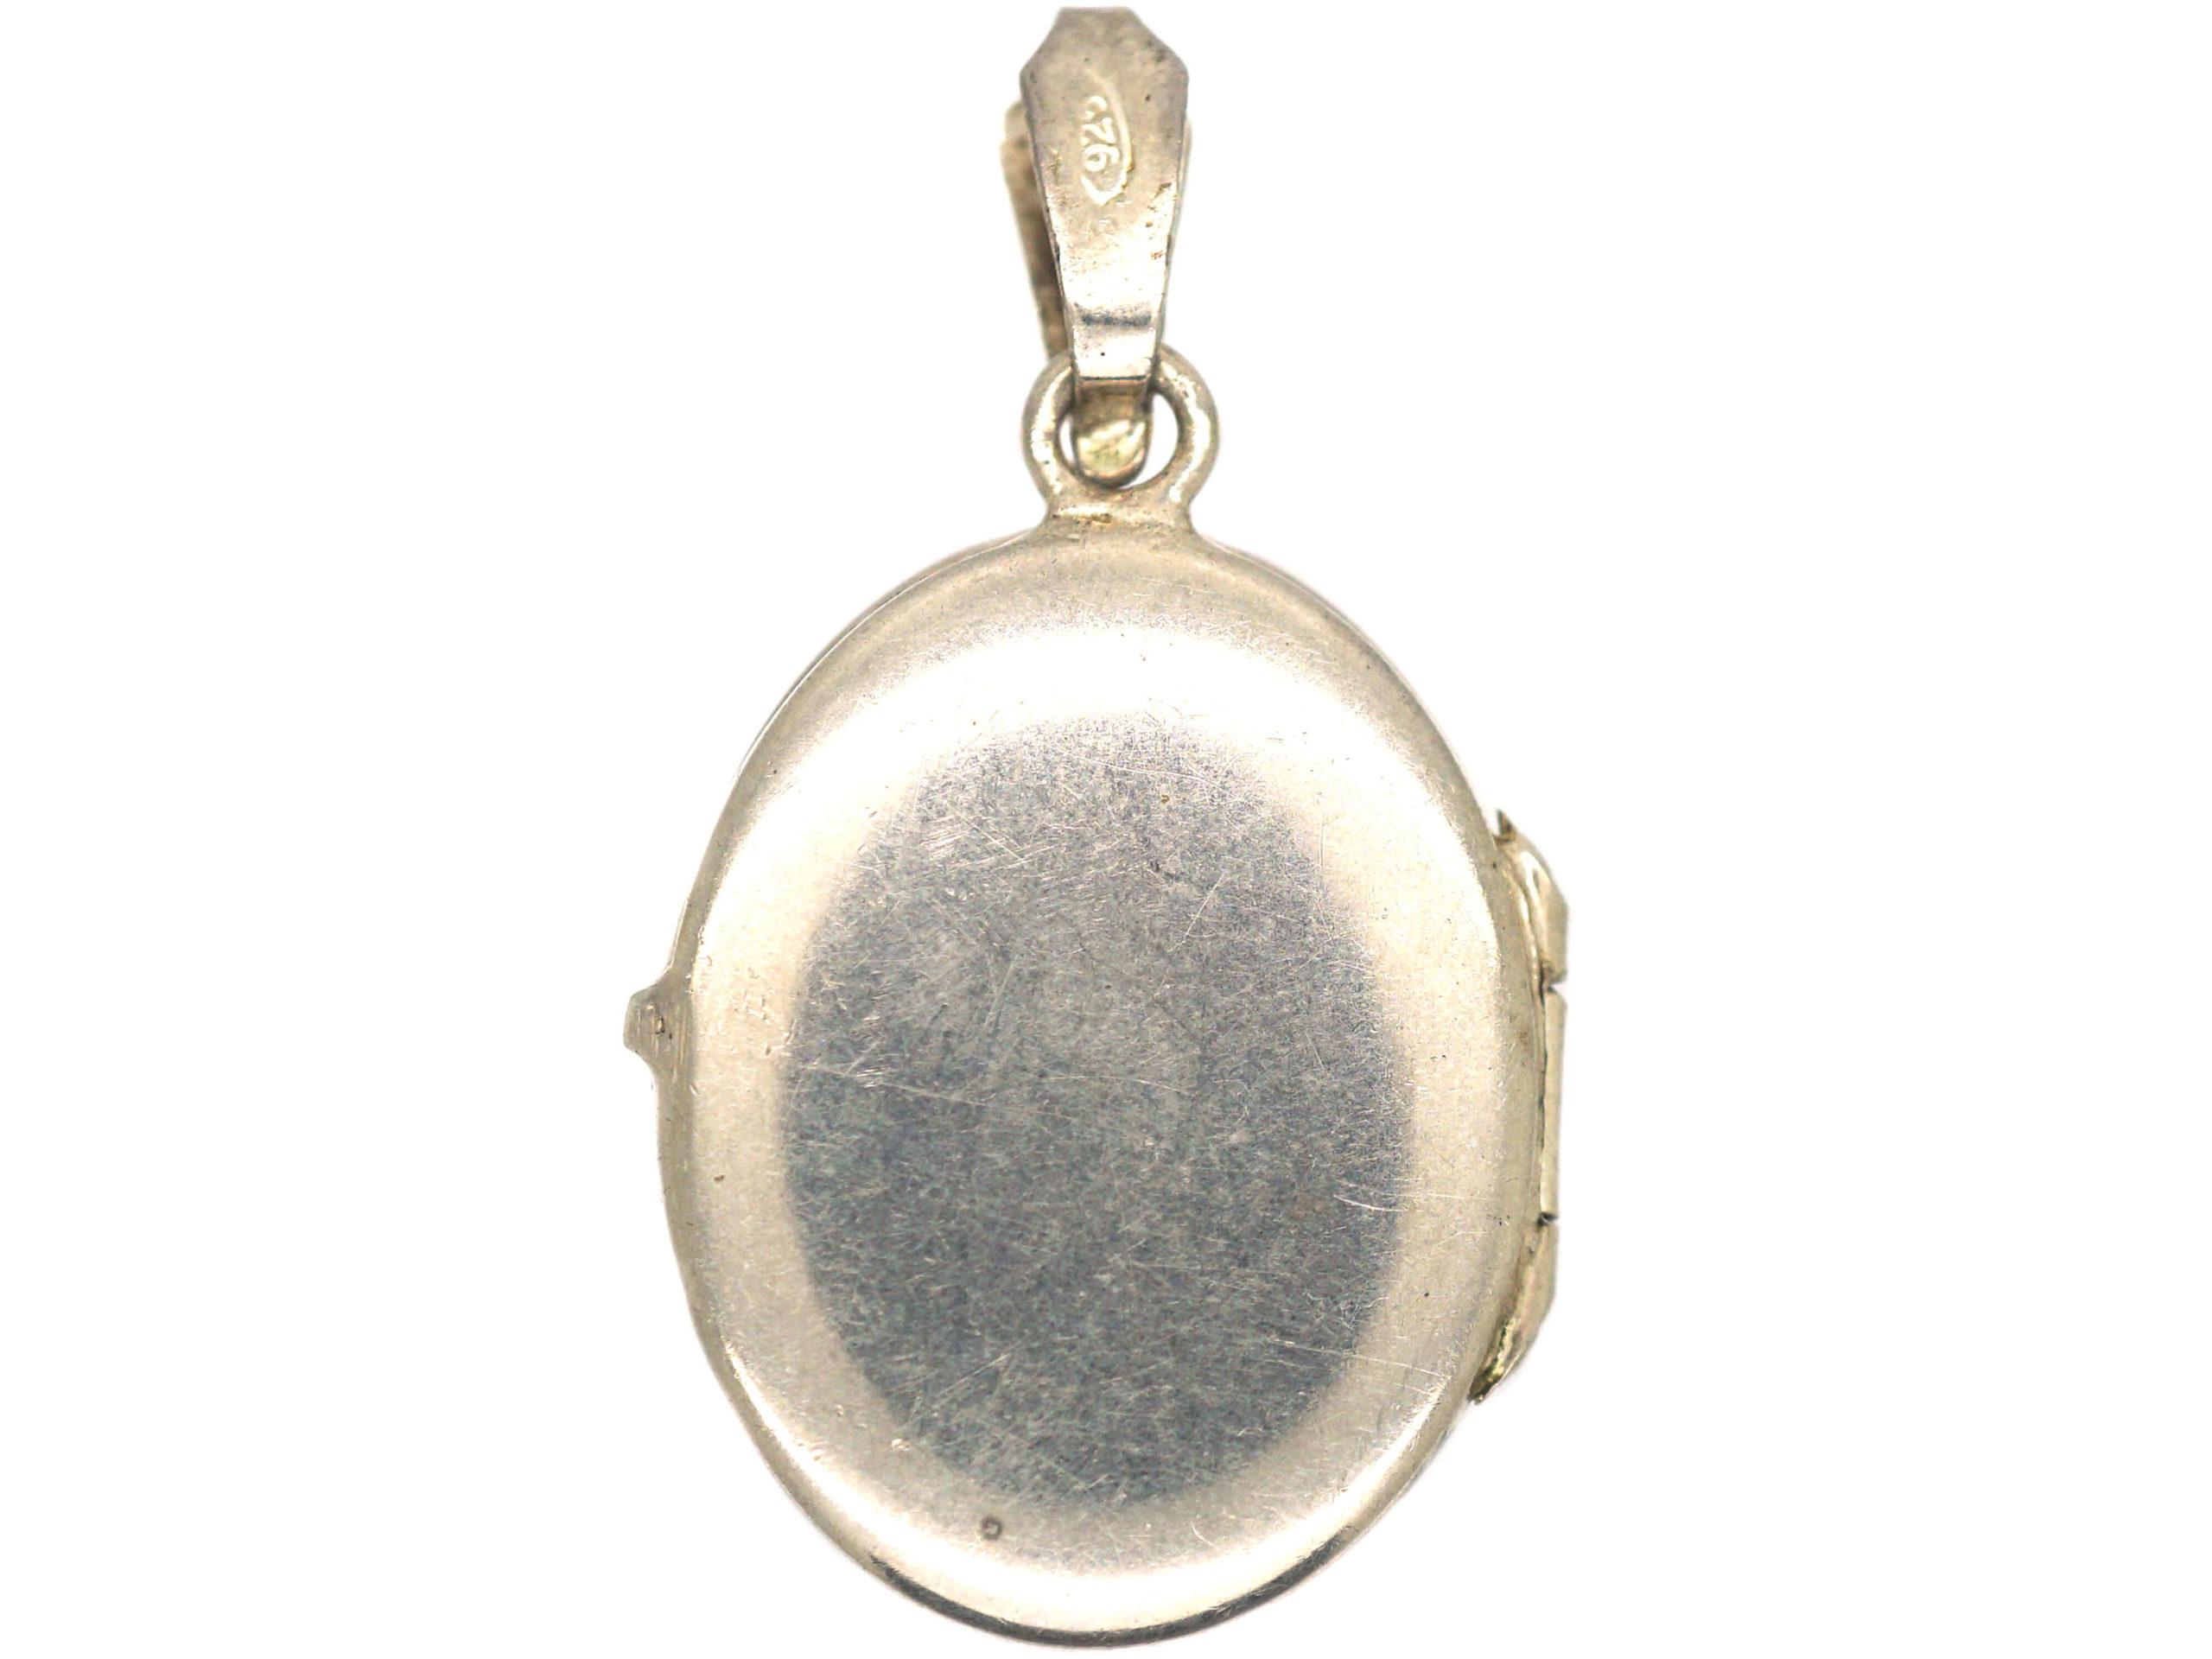 Silver Oval Locket with Leaf Design